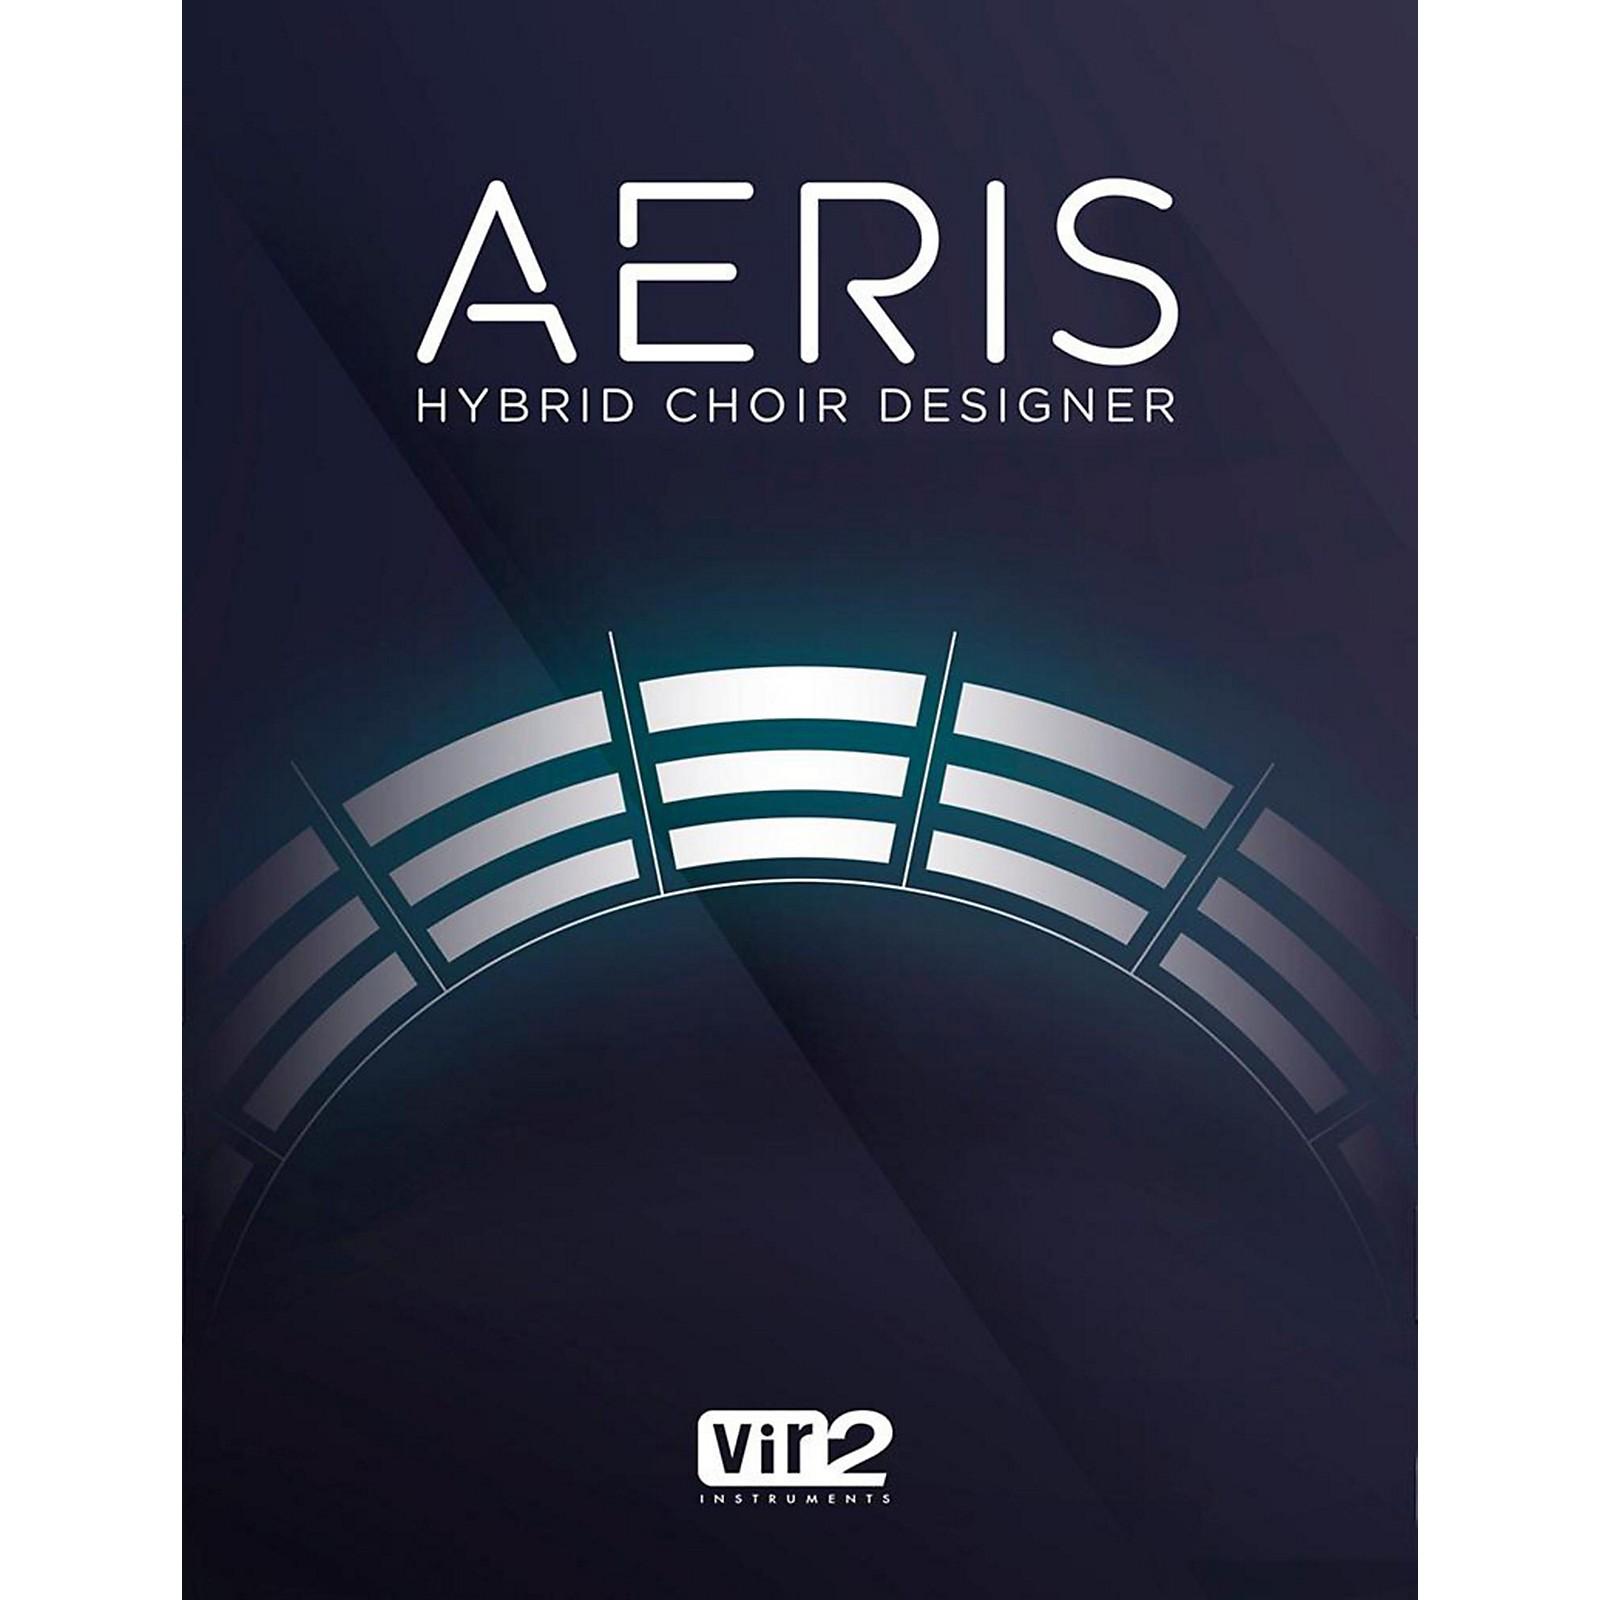 Big Fish Aeris: Hybrid Choir Designer